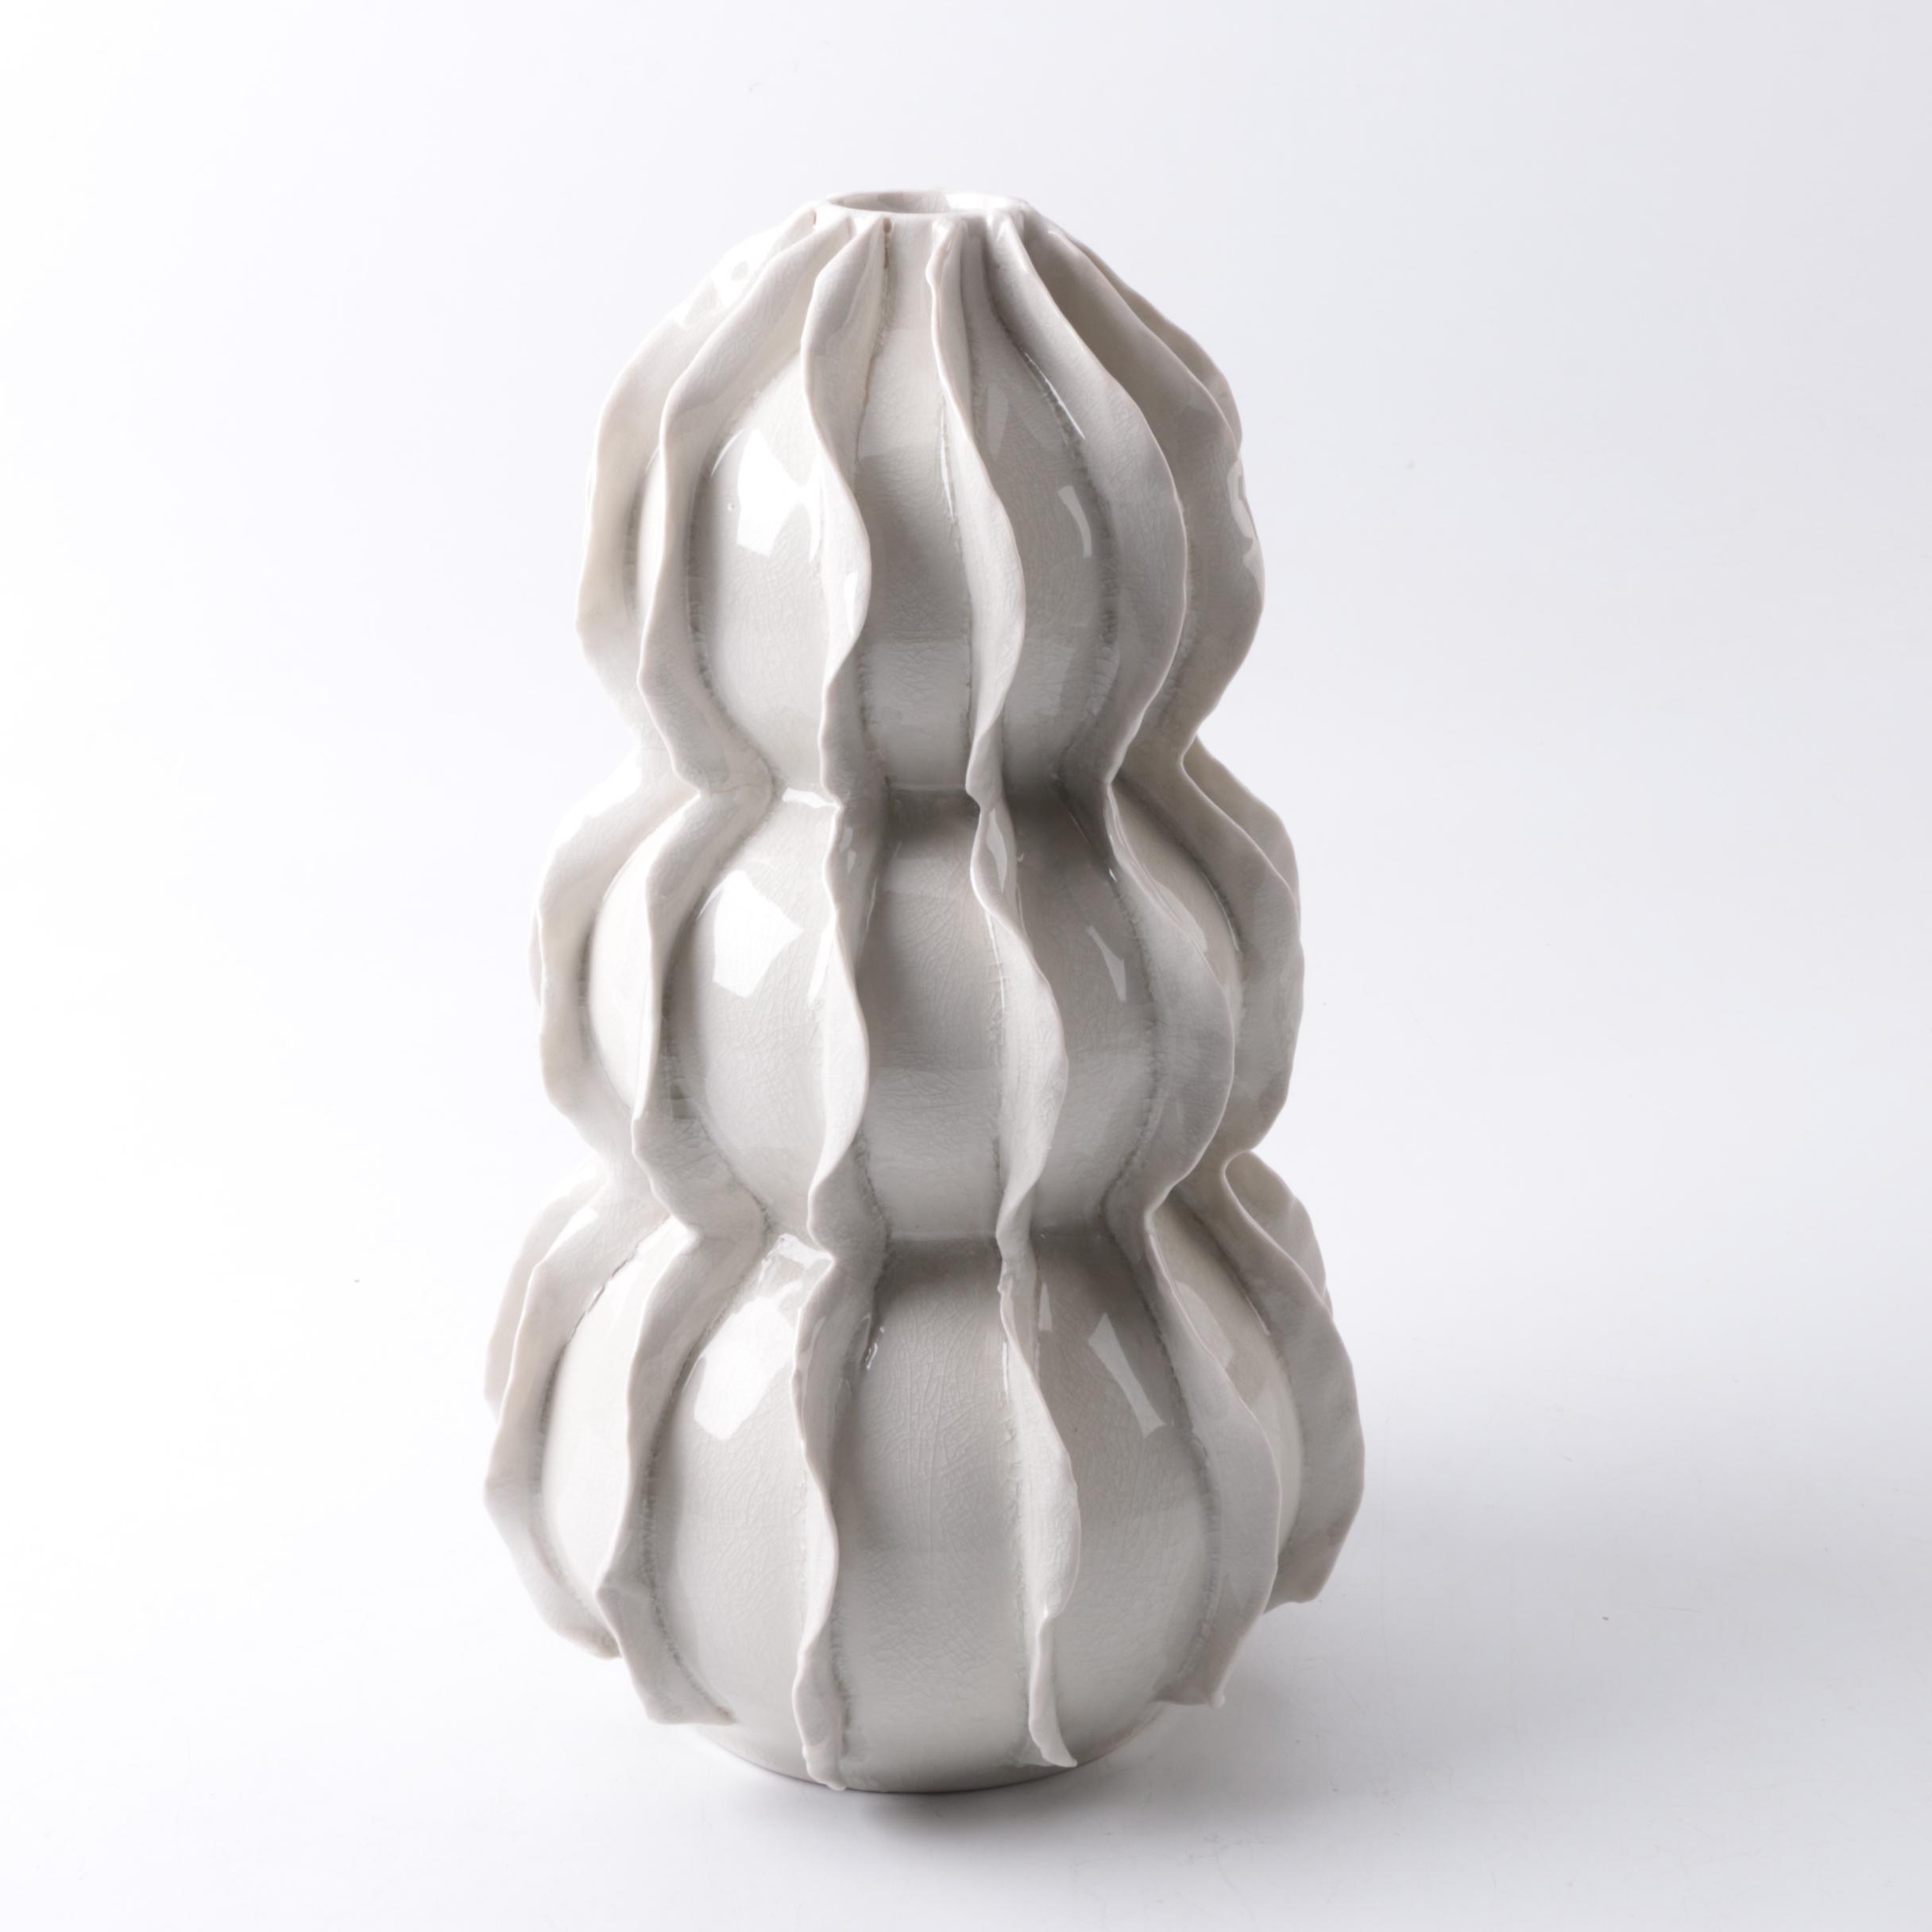 Mid Century Modern Style Ruffled Ceramic Vase